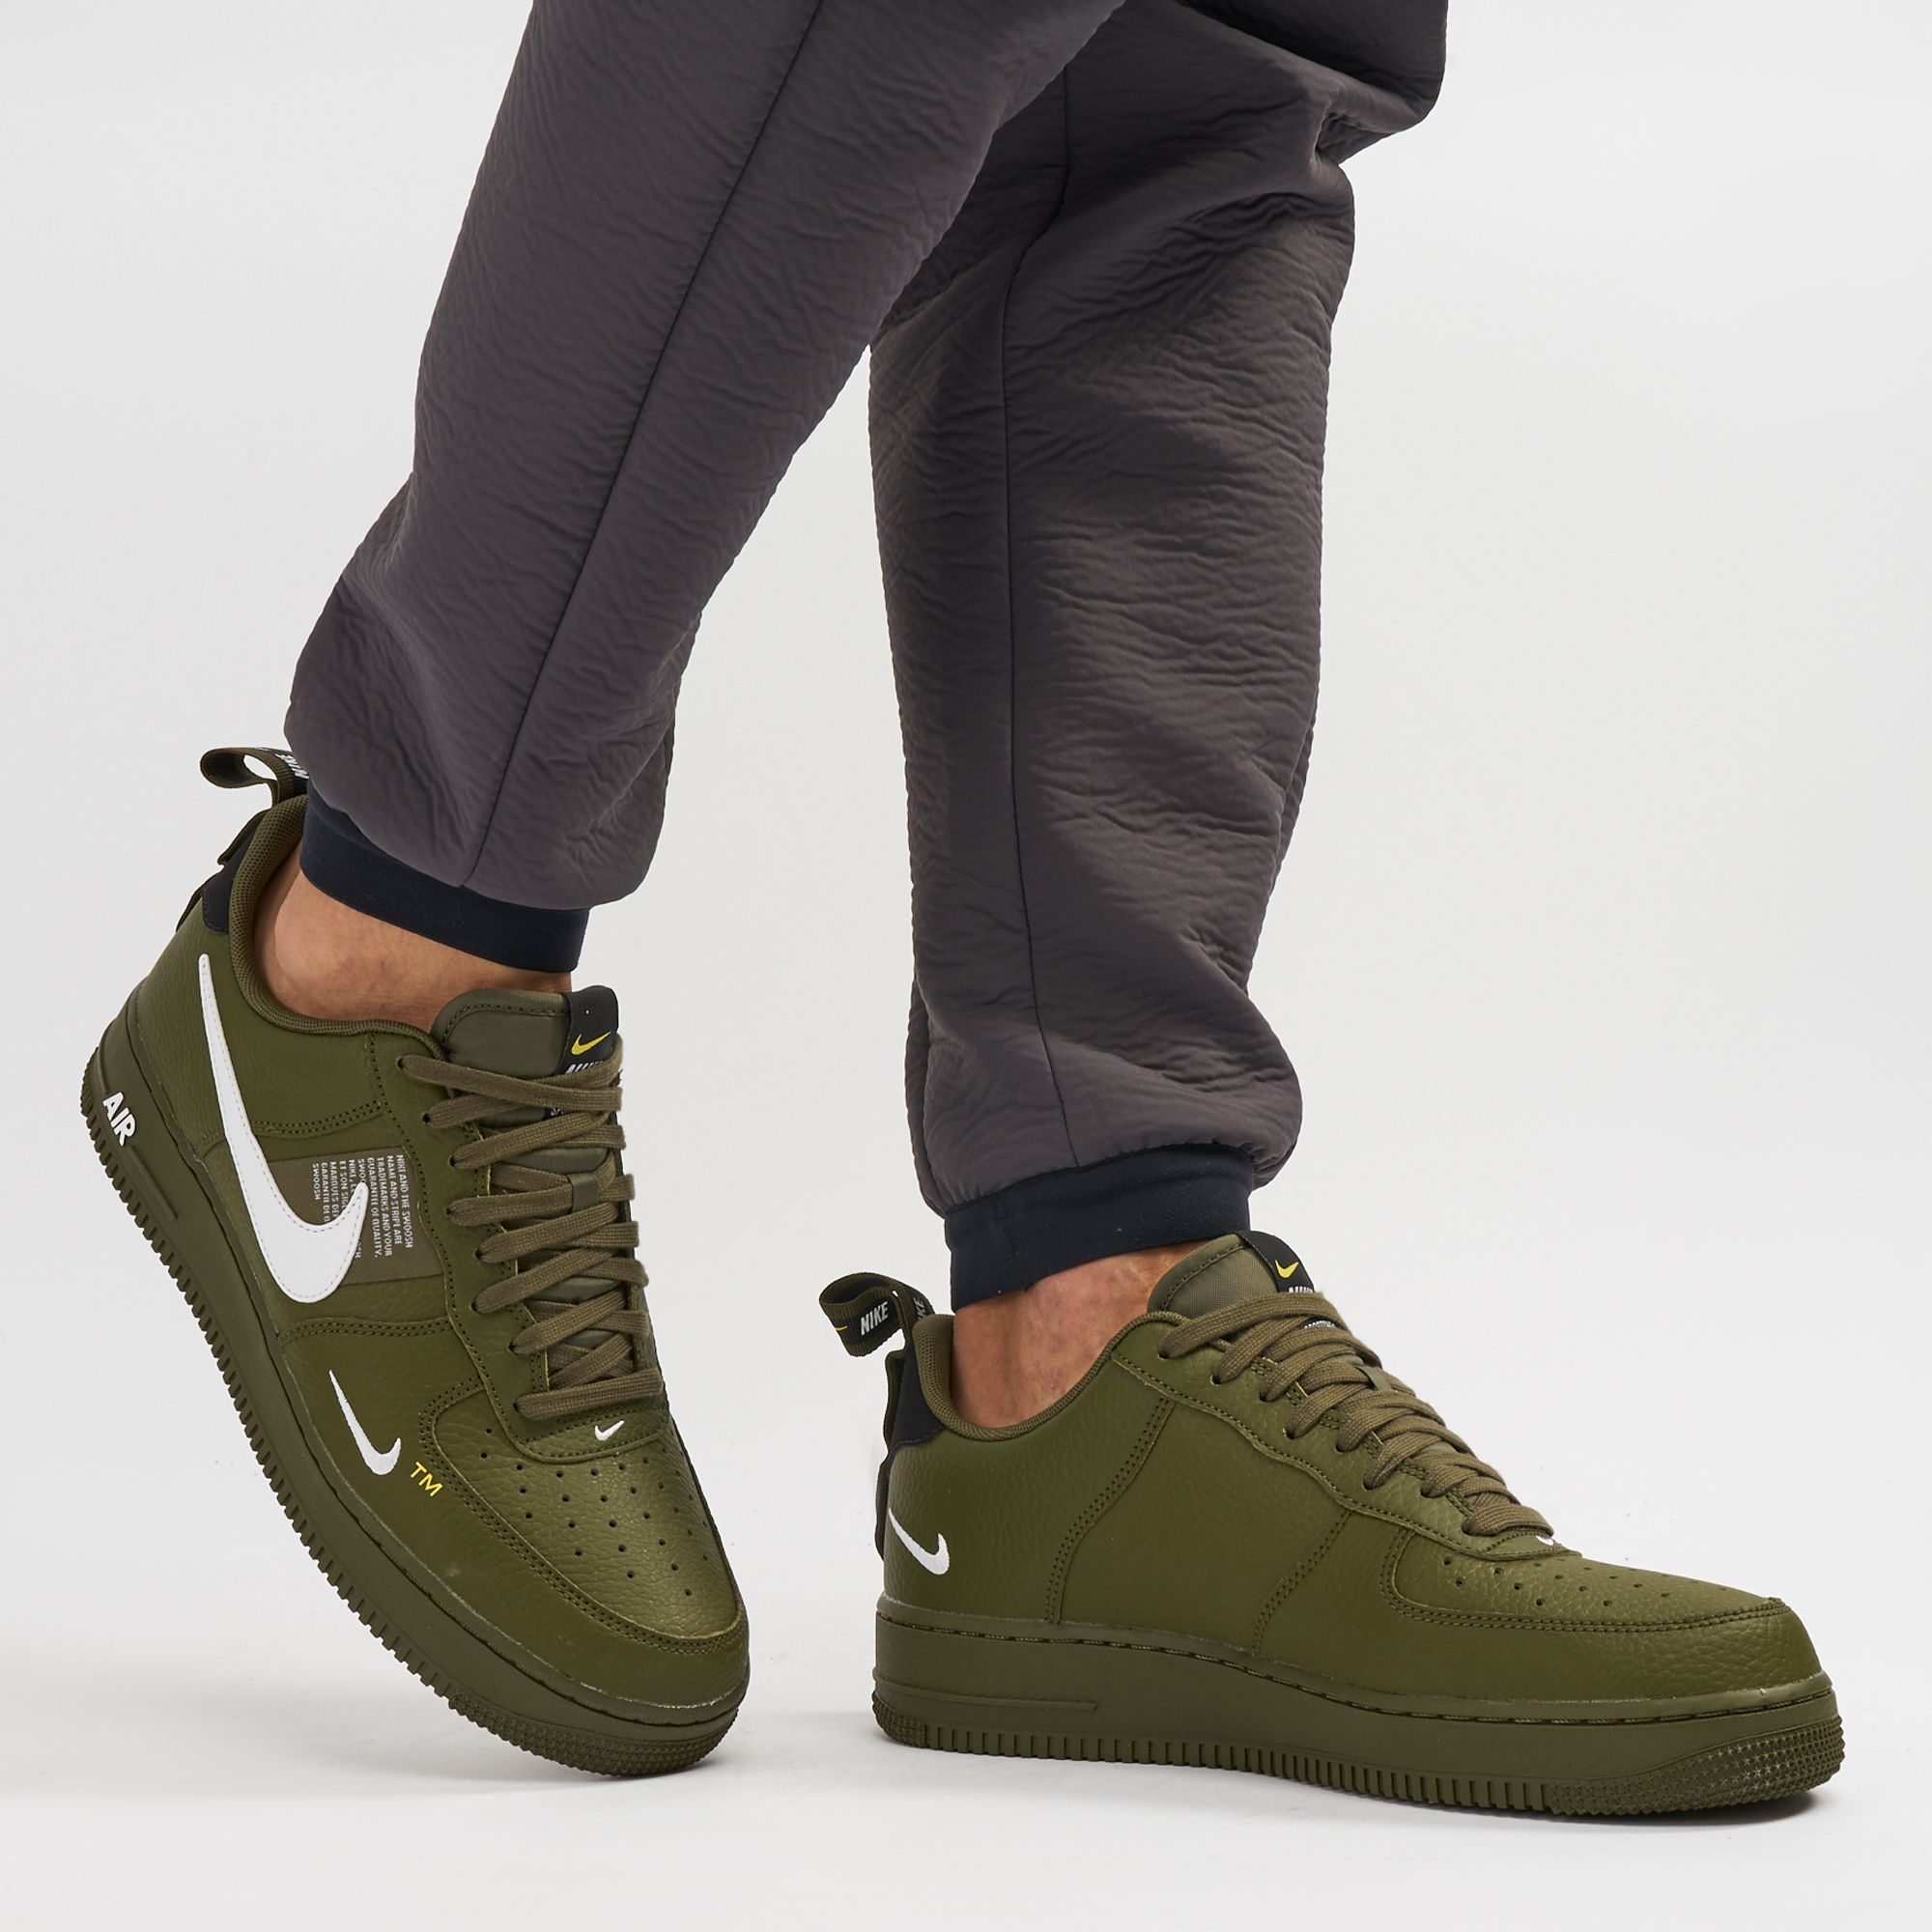 buy popular aa80f 256f2 ... greece nike air force 1 07 lv8 utility shoe 1694a b061c